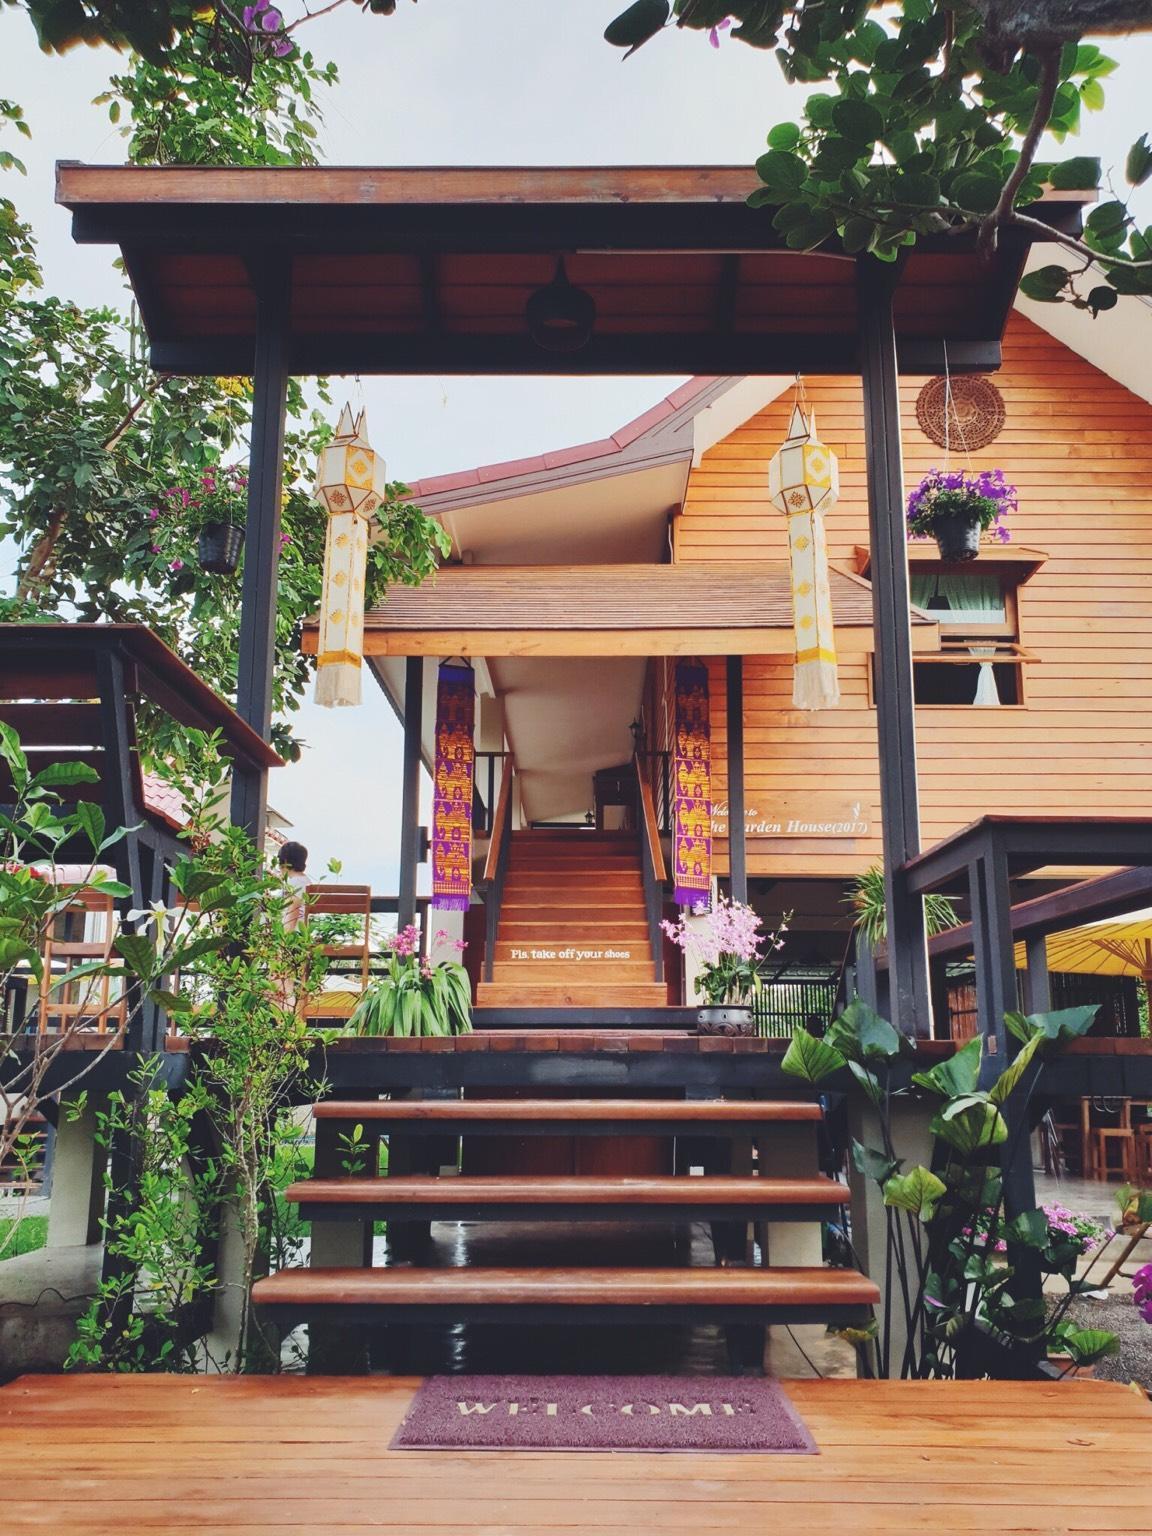 Tranquil wooden home   big garden   Thai breakfast วิลลา 1 ห้องนอน 1 ห้องน้ำส่วนตัว ขนาด 1600 ตร.ม. – เจริญเมือง